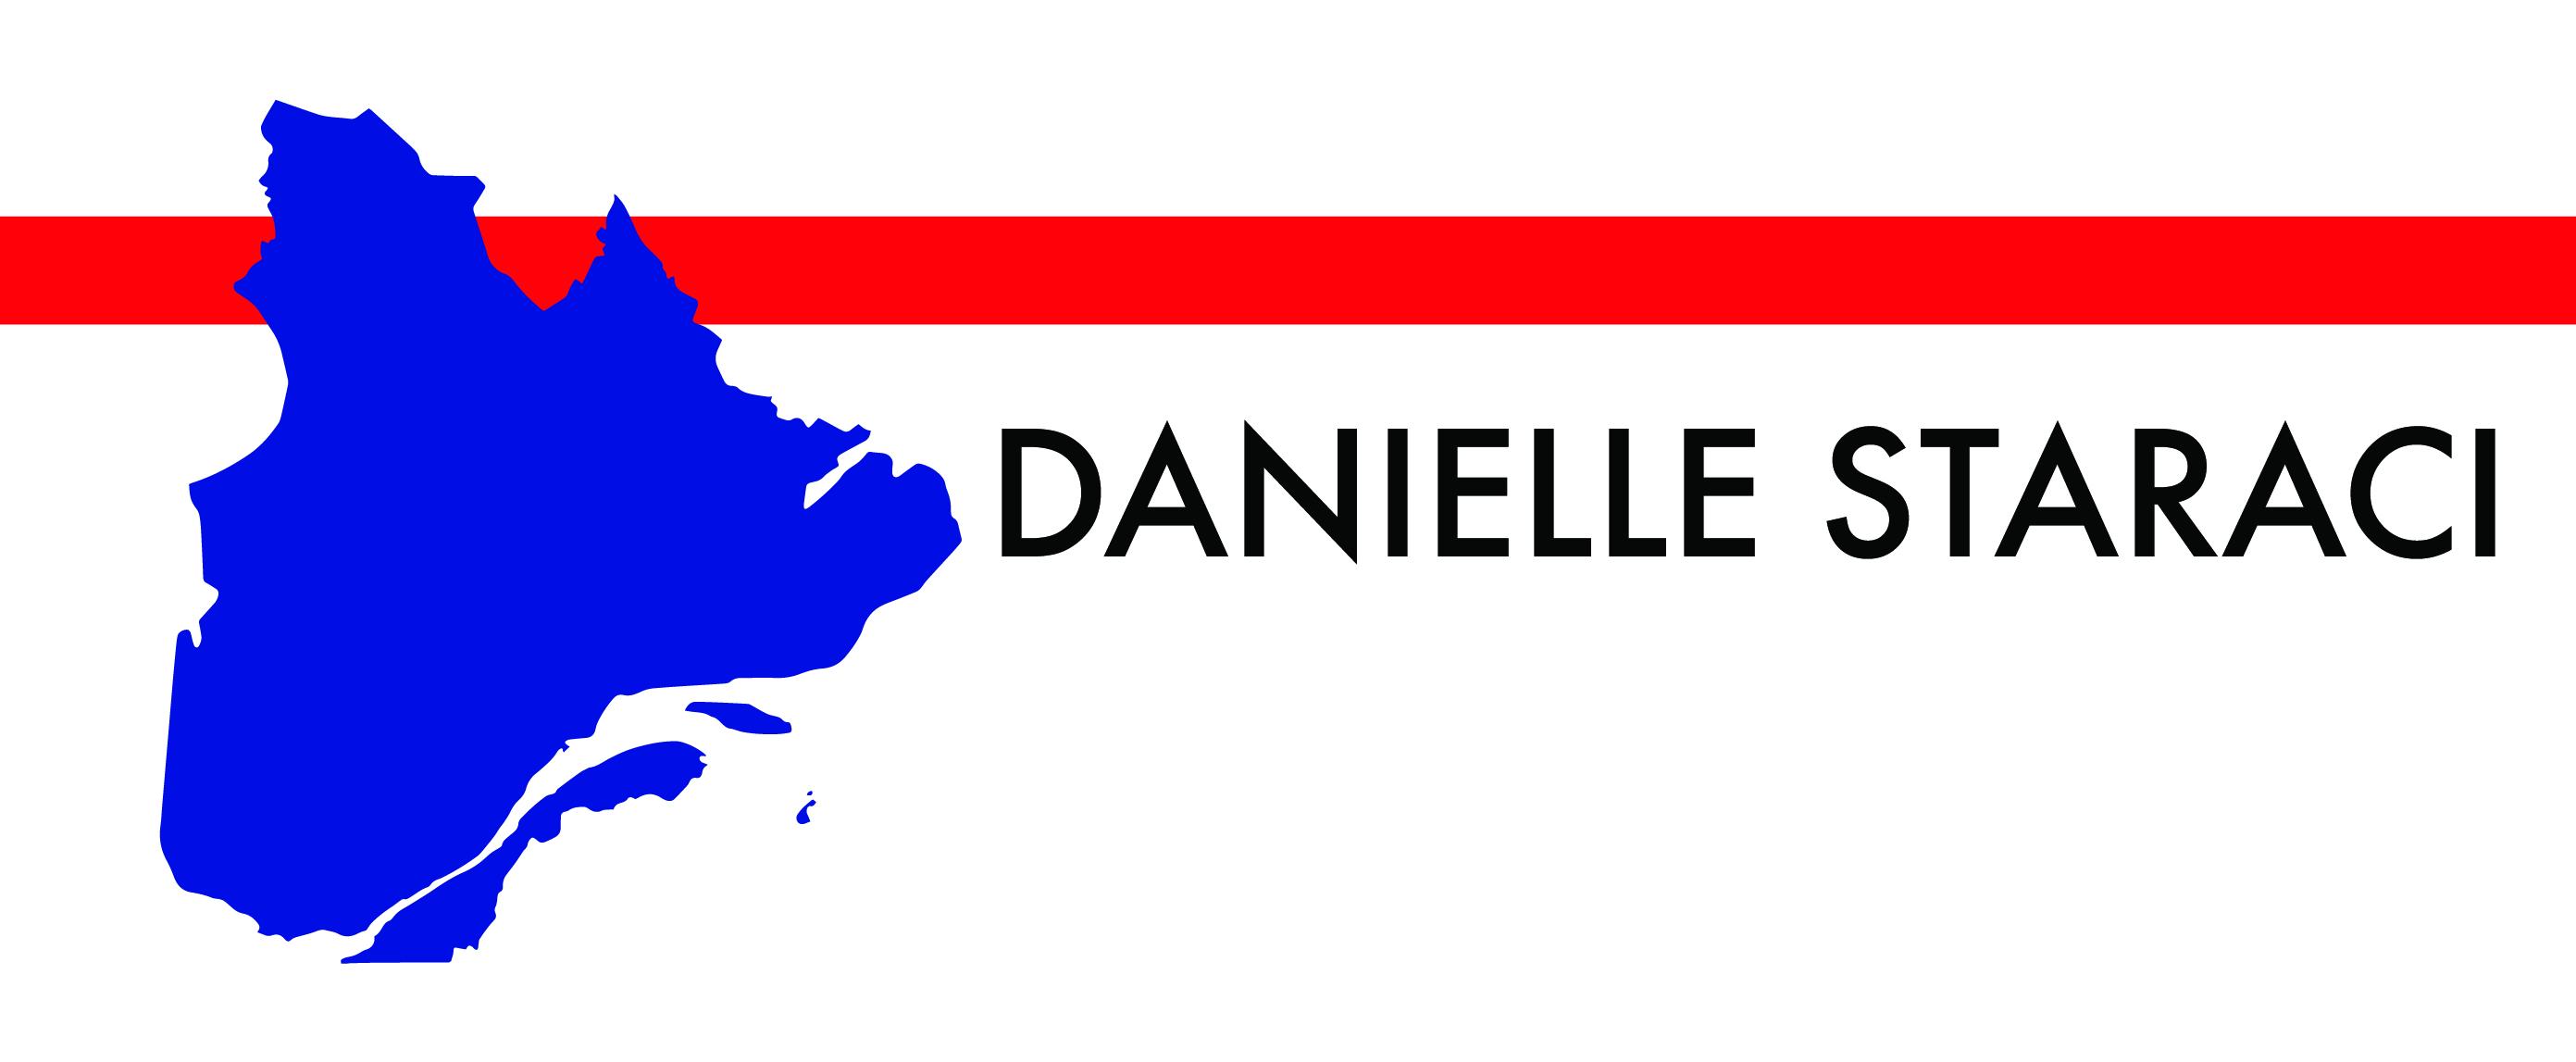 Danielle Staraci Mobilité Logo